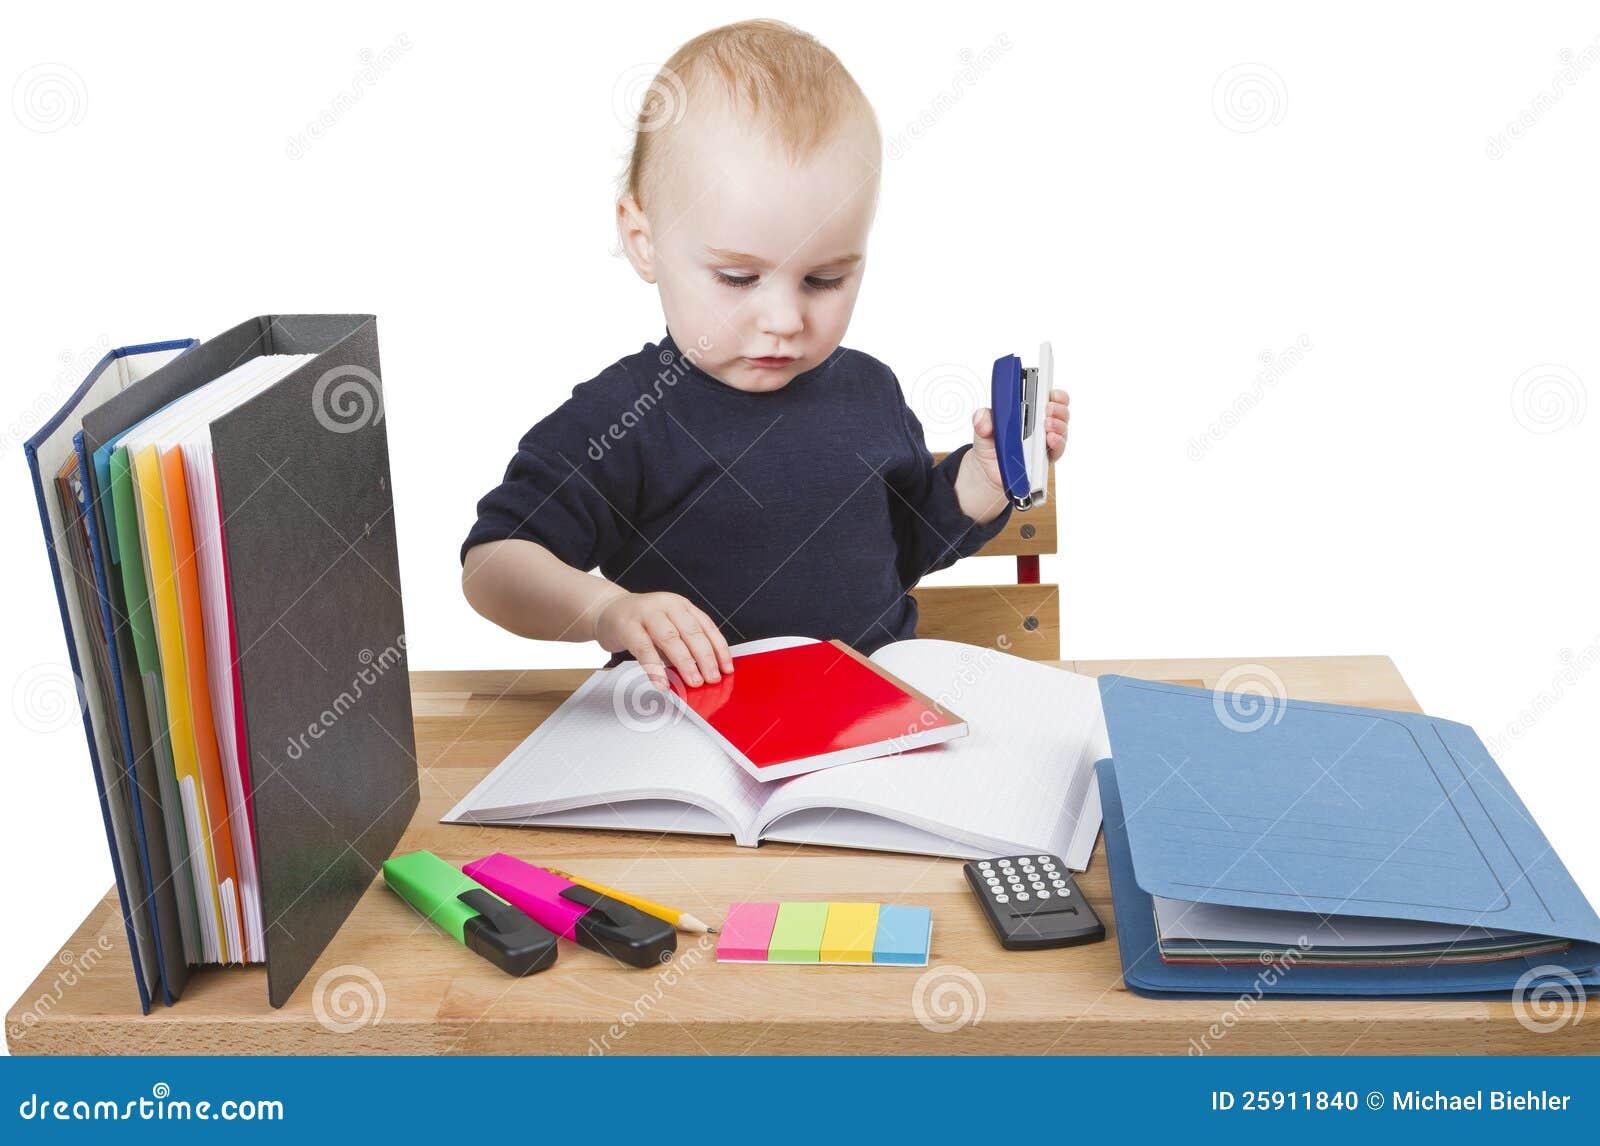 Child writing at desk